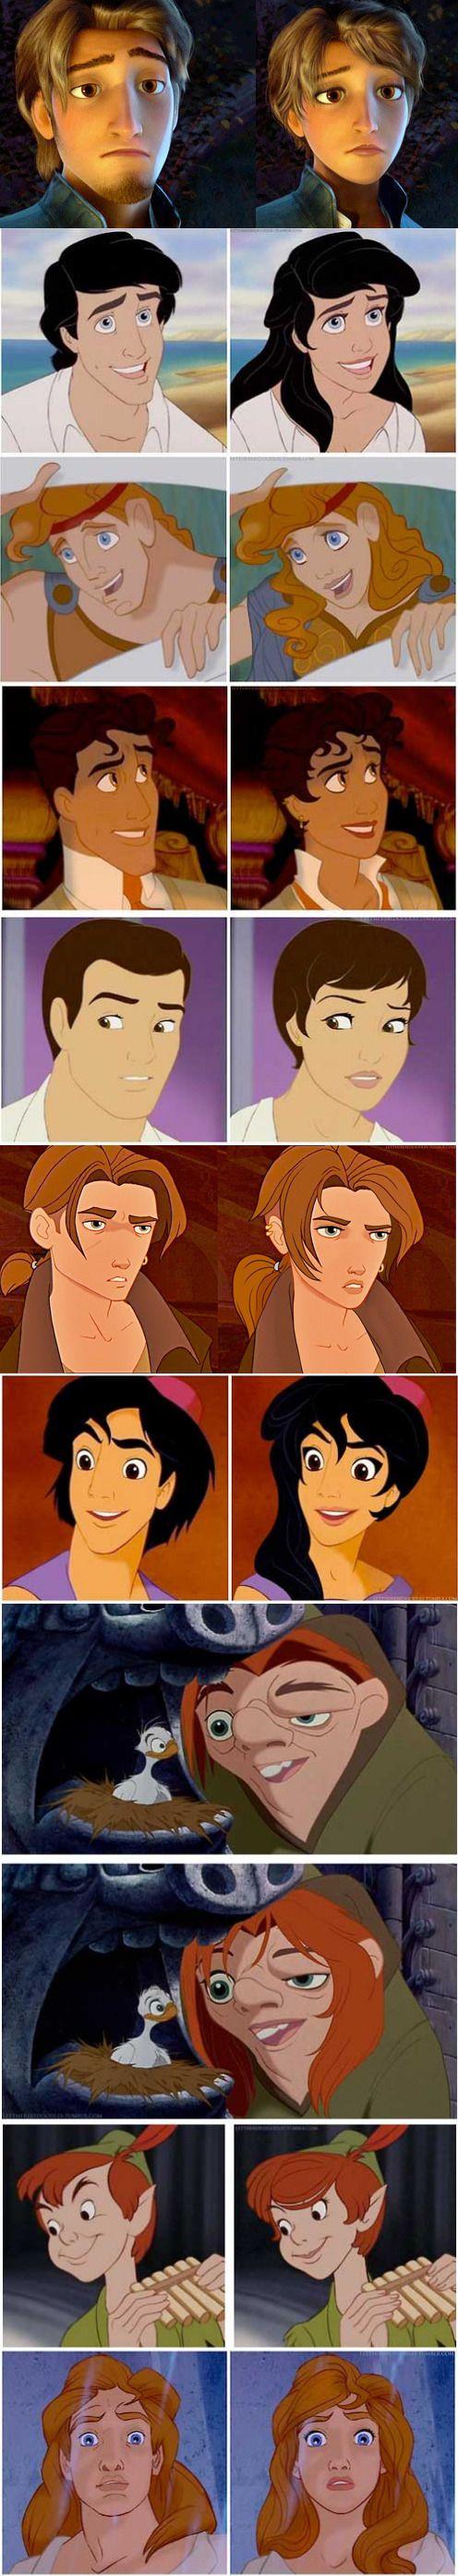 Gender-Bending Disney Characters.